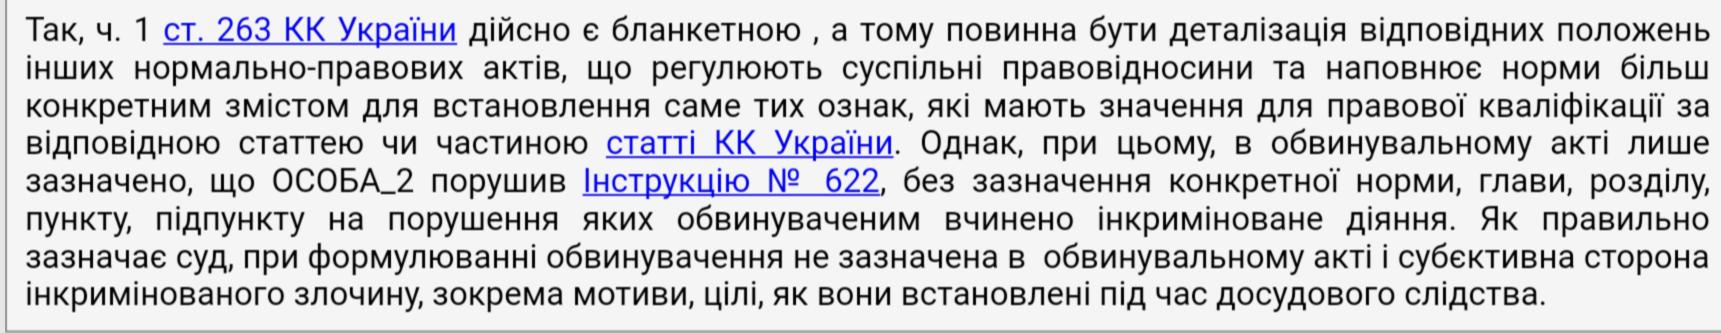 Апеляційний суд Київської області ухвала